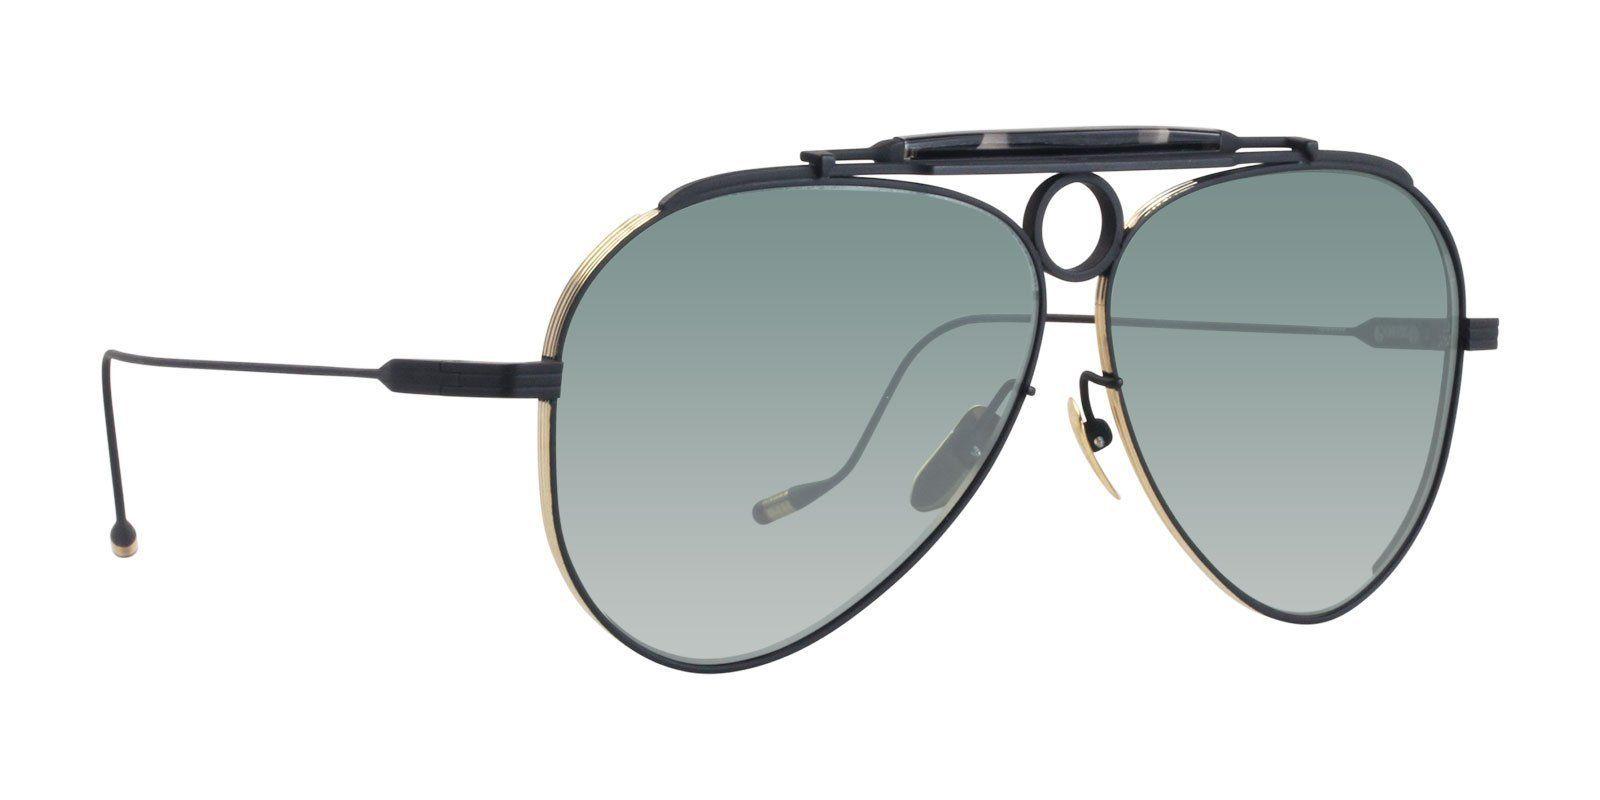 0e8d55aab6c Jacques Marie Mage - Gonzo Duke Black - Turquoise sunglasses ...